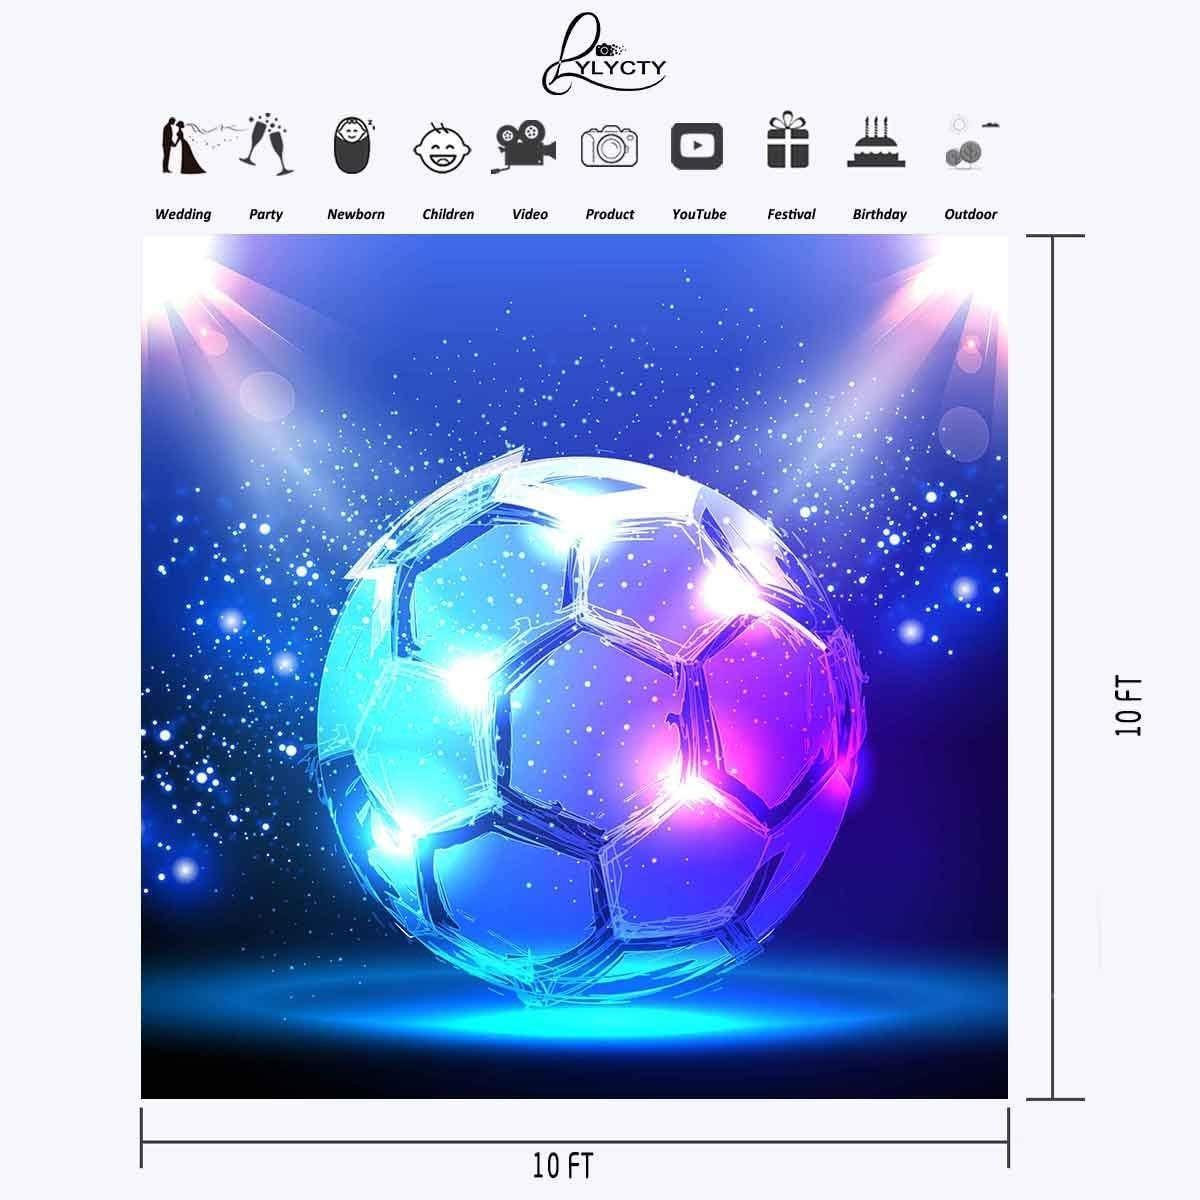 GoEoo Digital Photography Wallpaper Studio Props Vinyl Background World Cup 2018 Backdrops 7X5FT GoEoo/_dn060